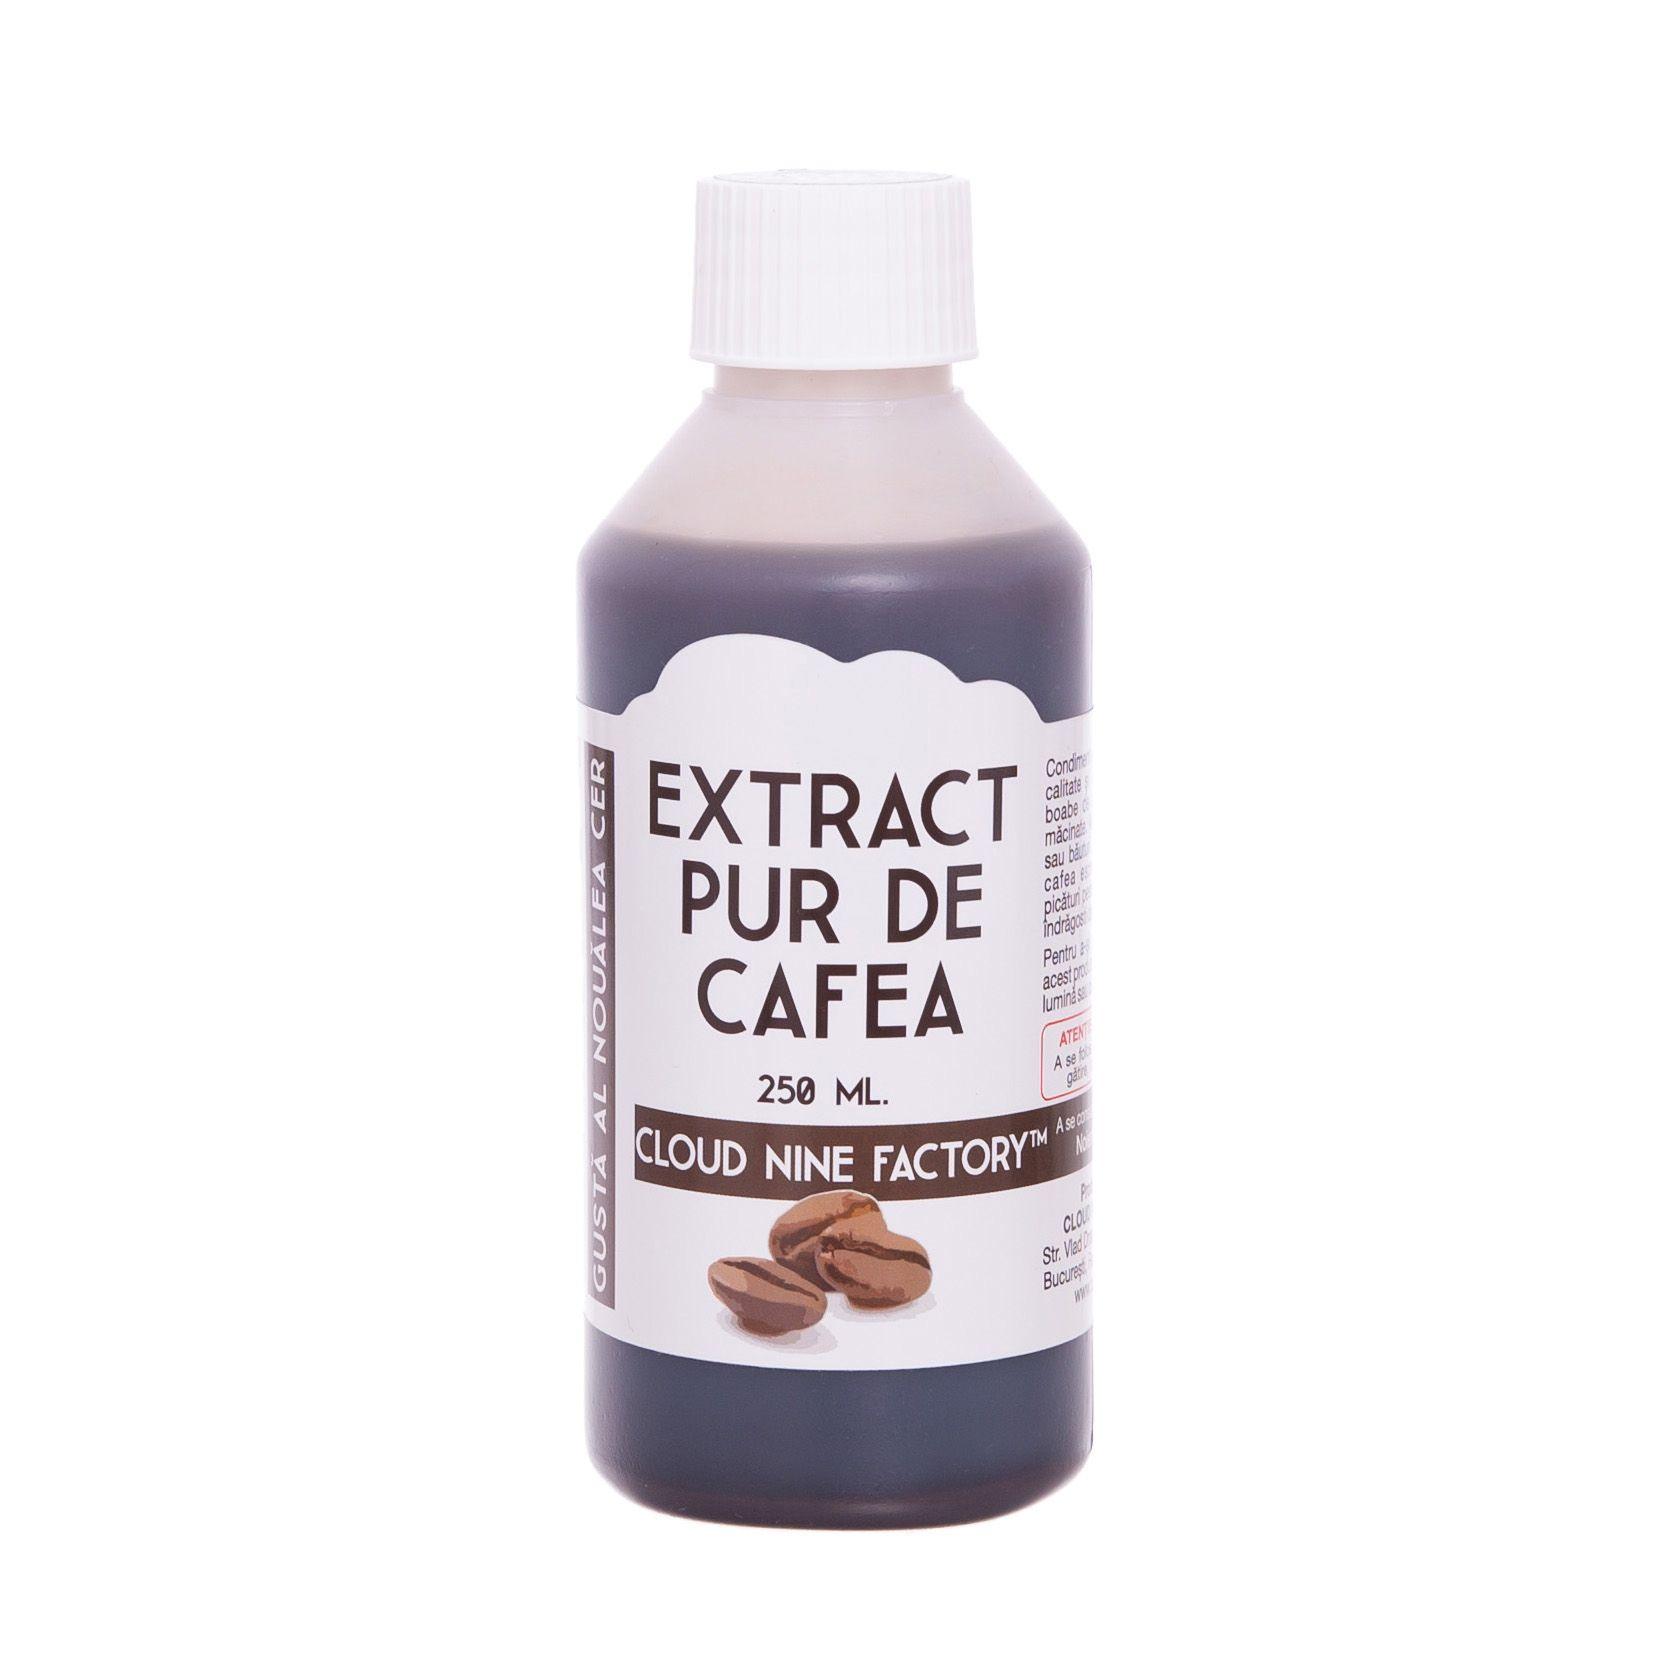 Extract Pur de Cafea (250 ml.) Extract Pur de Cafea (250 ml.) - IMG 2619 - Extract Pur de Cafea (250 ml.) Extract Pur de Cafea - IMG 2619 - Extract Pur de Cafea